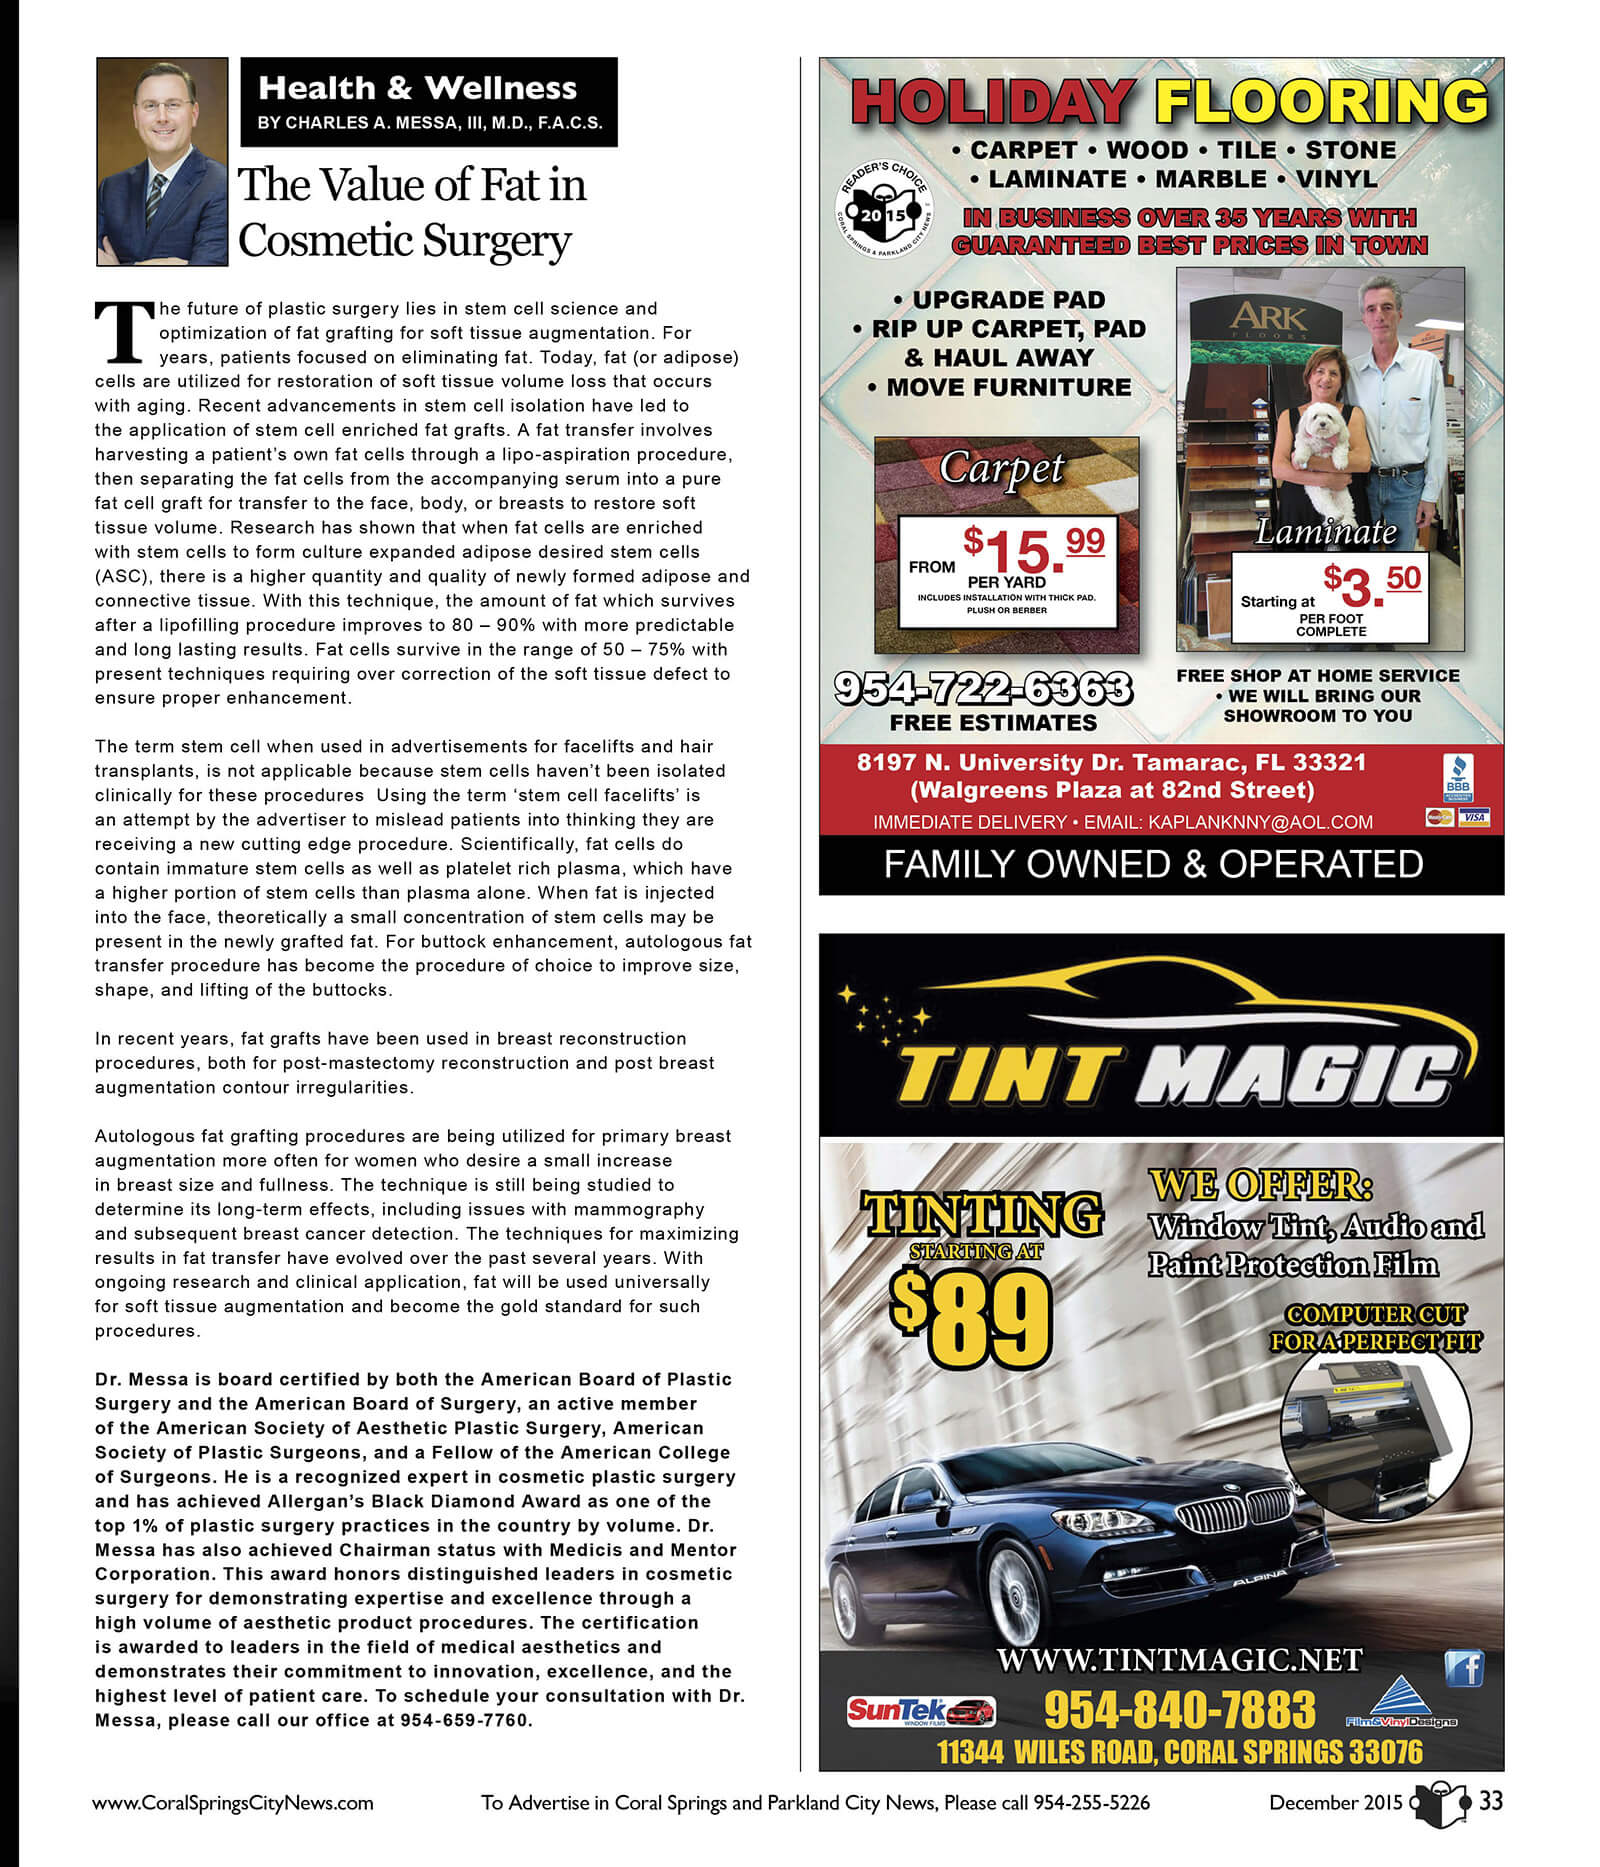 plastic surgery articles 2012